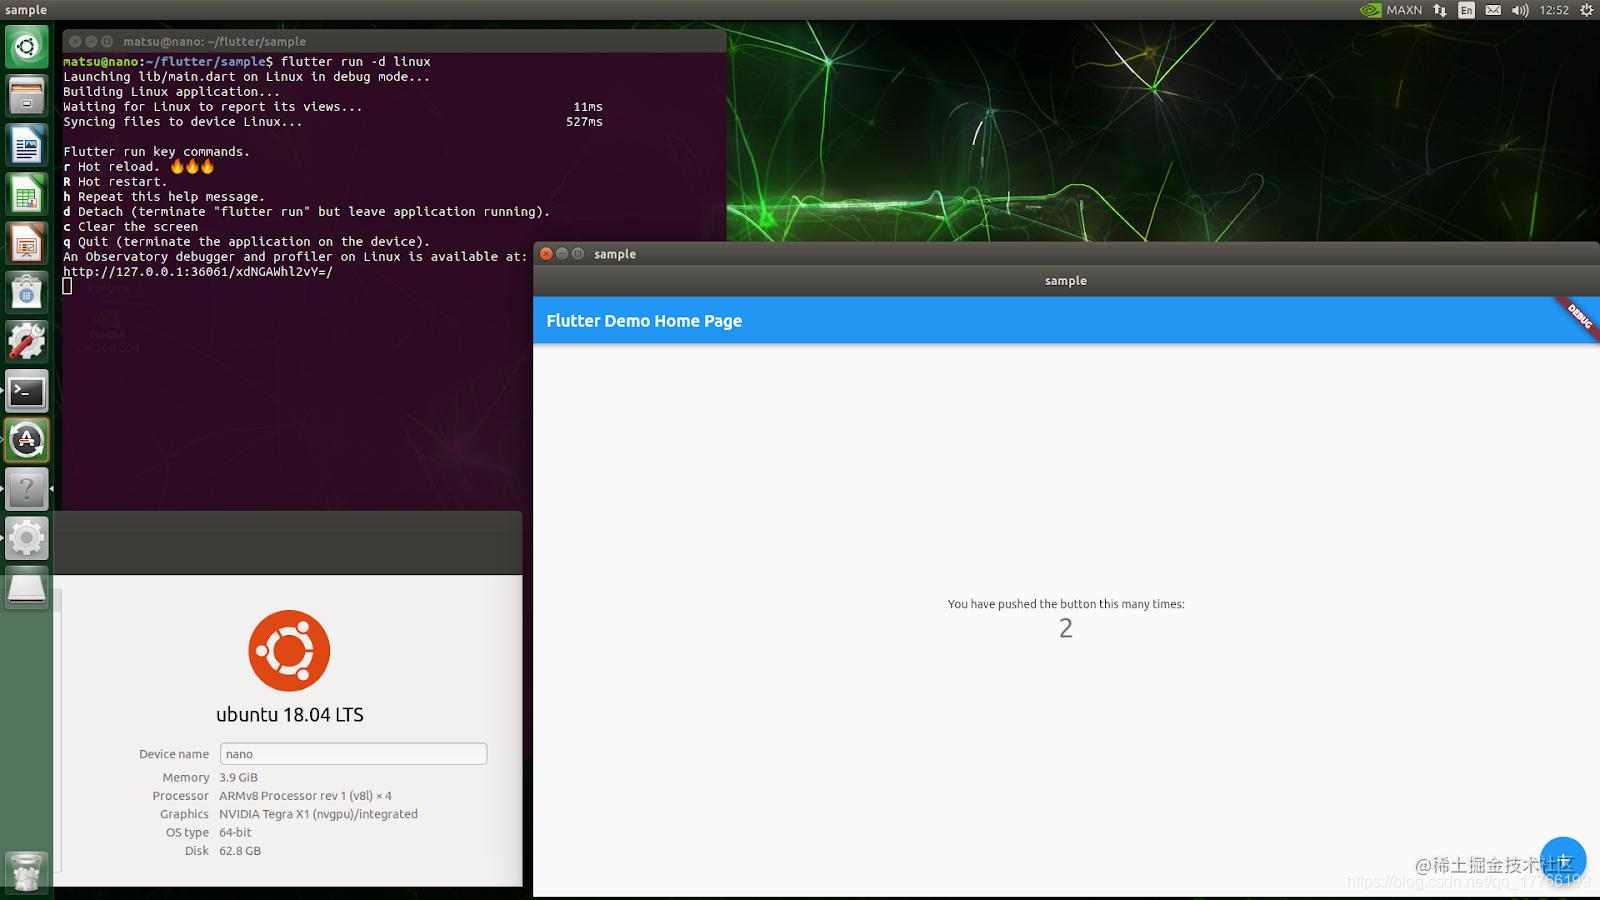 Your favorite Flutter app running on an ARM64 Linux machine